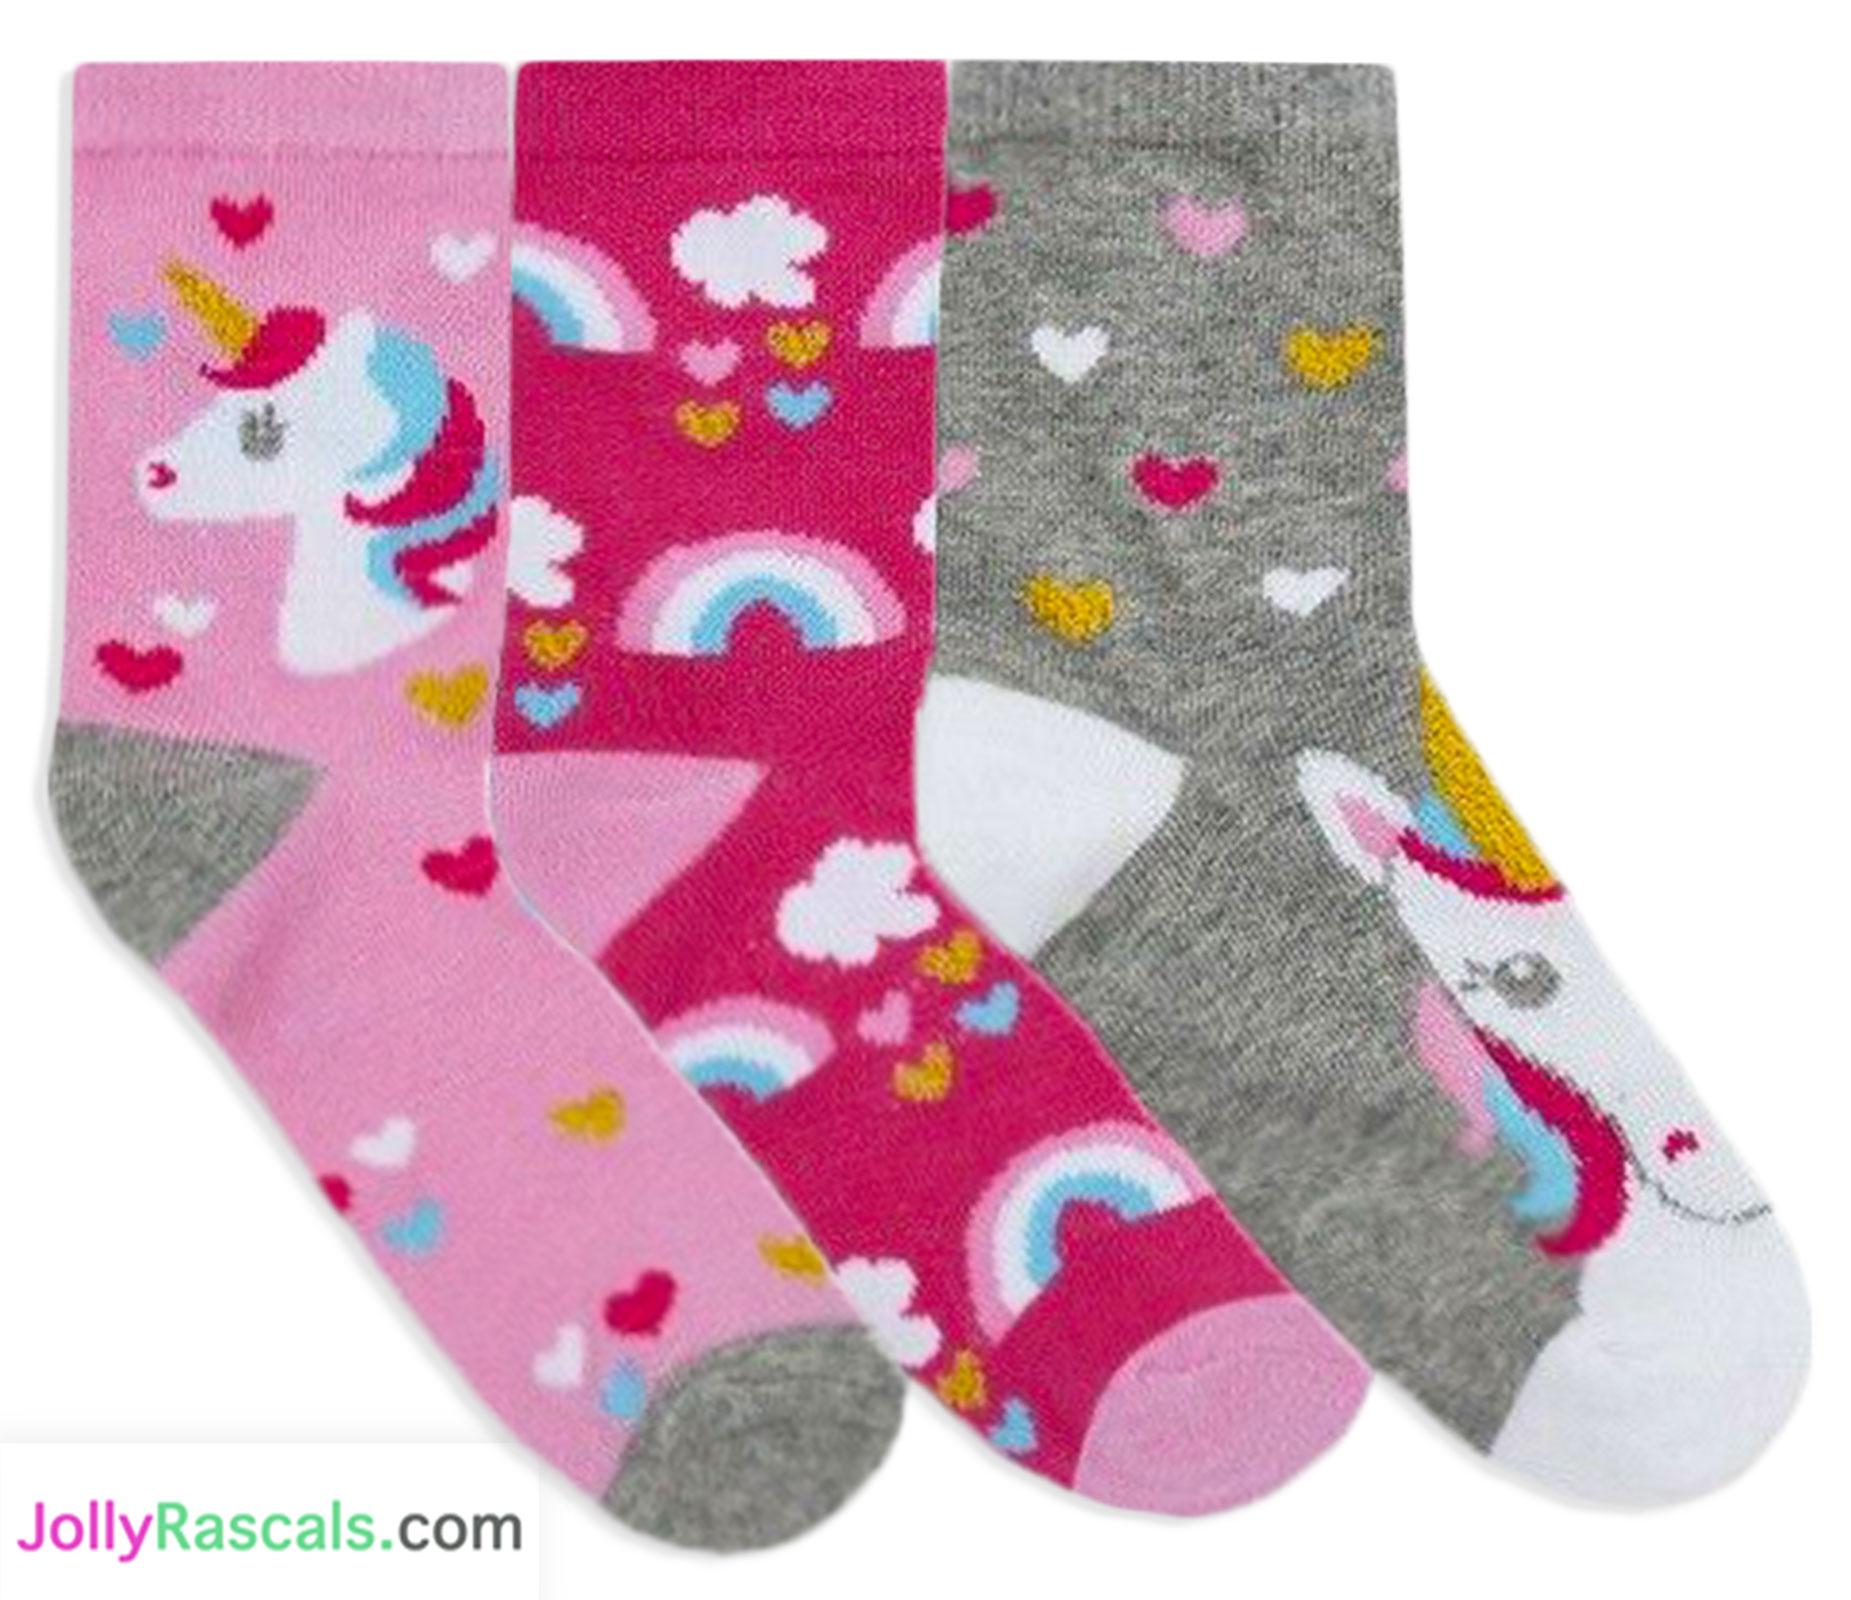 Girls Unicorn Socks 3 Pairs Kids Ankle Socks Cotton Rich